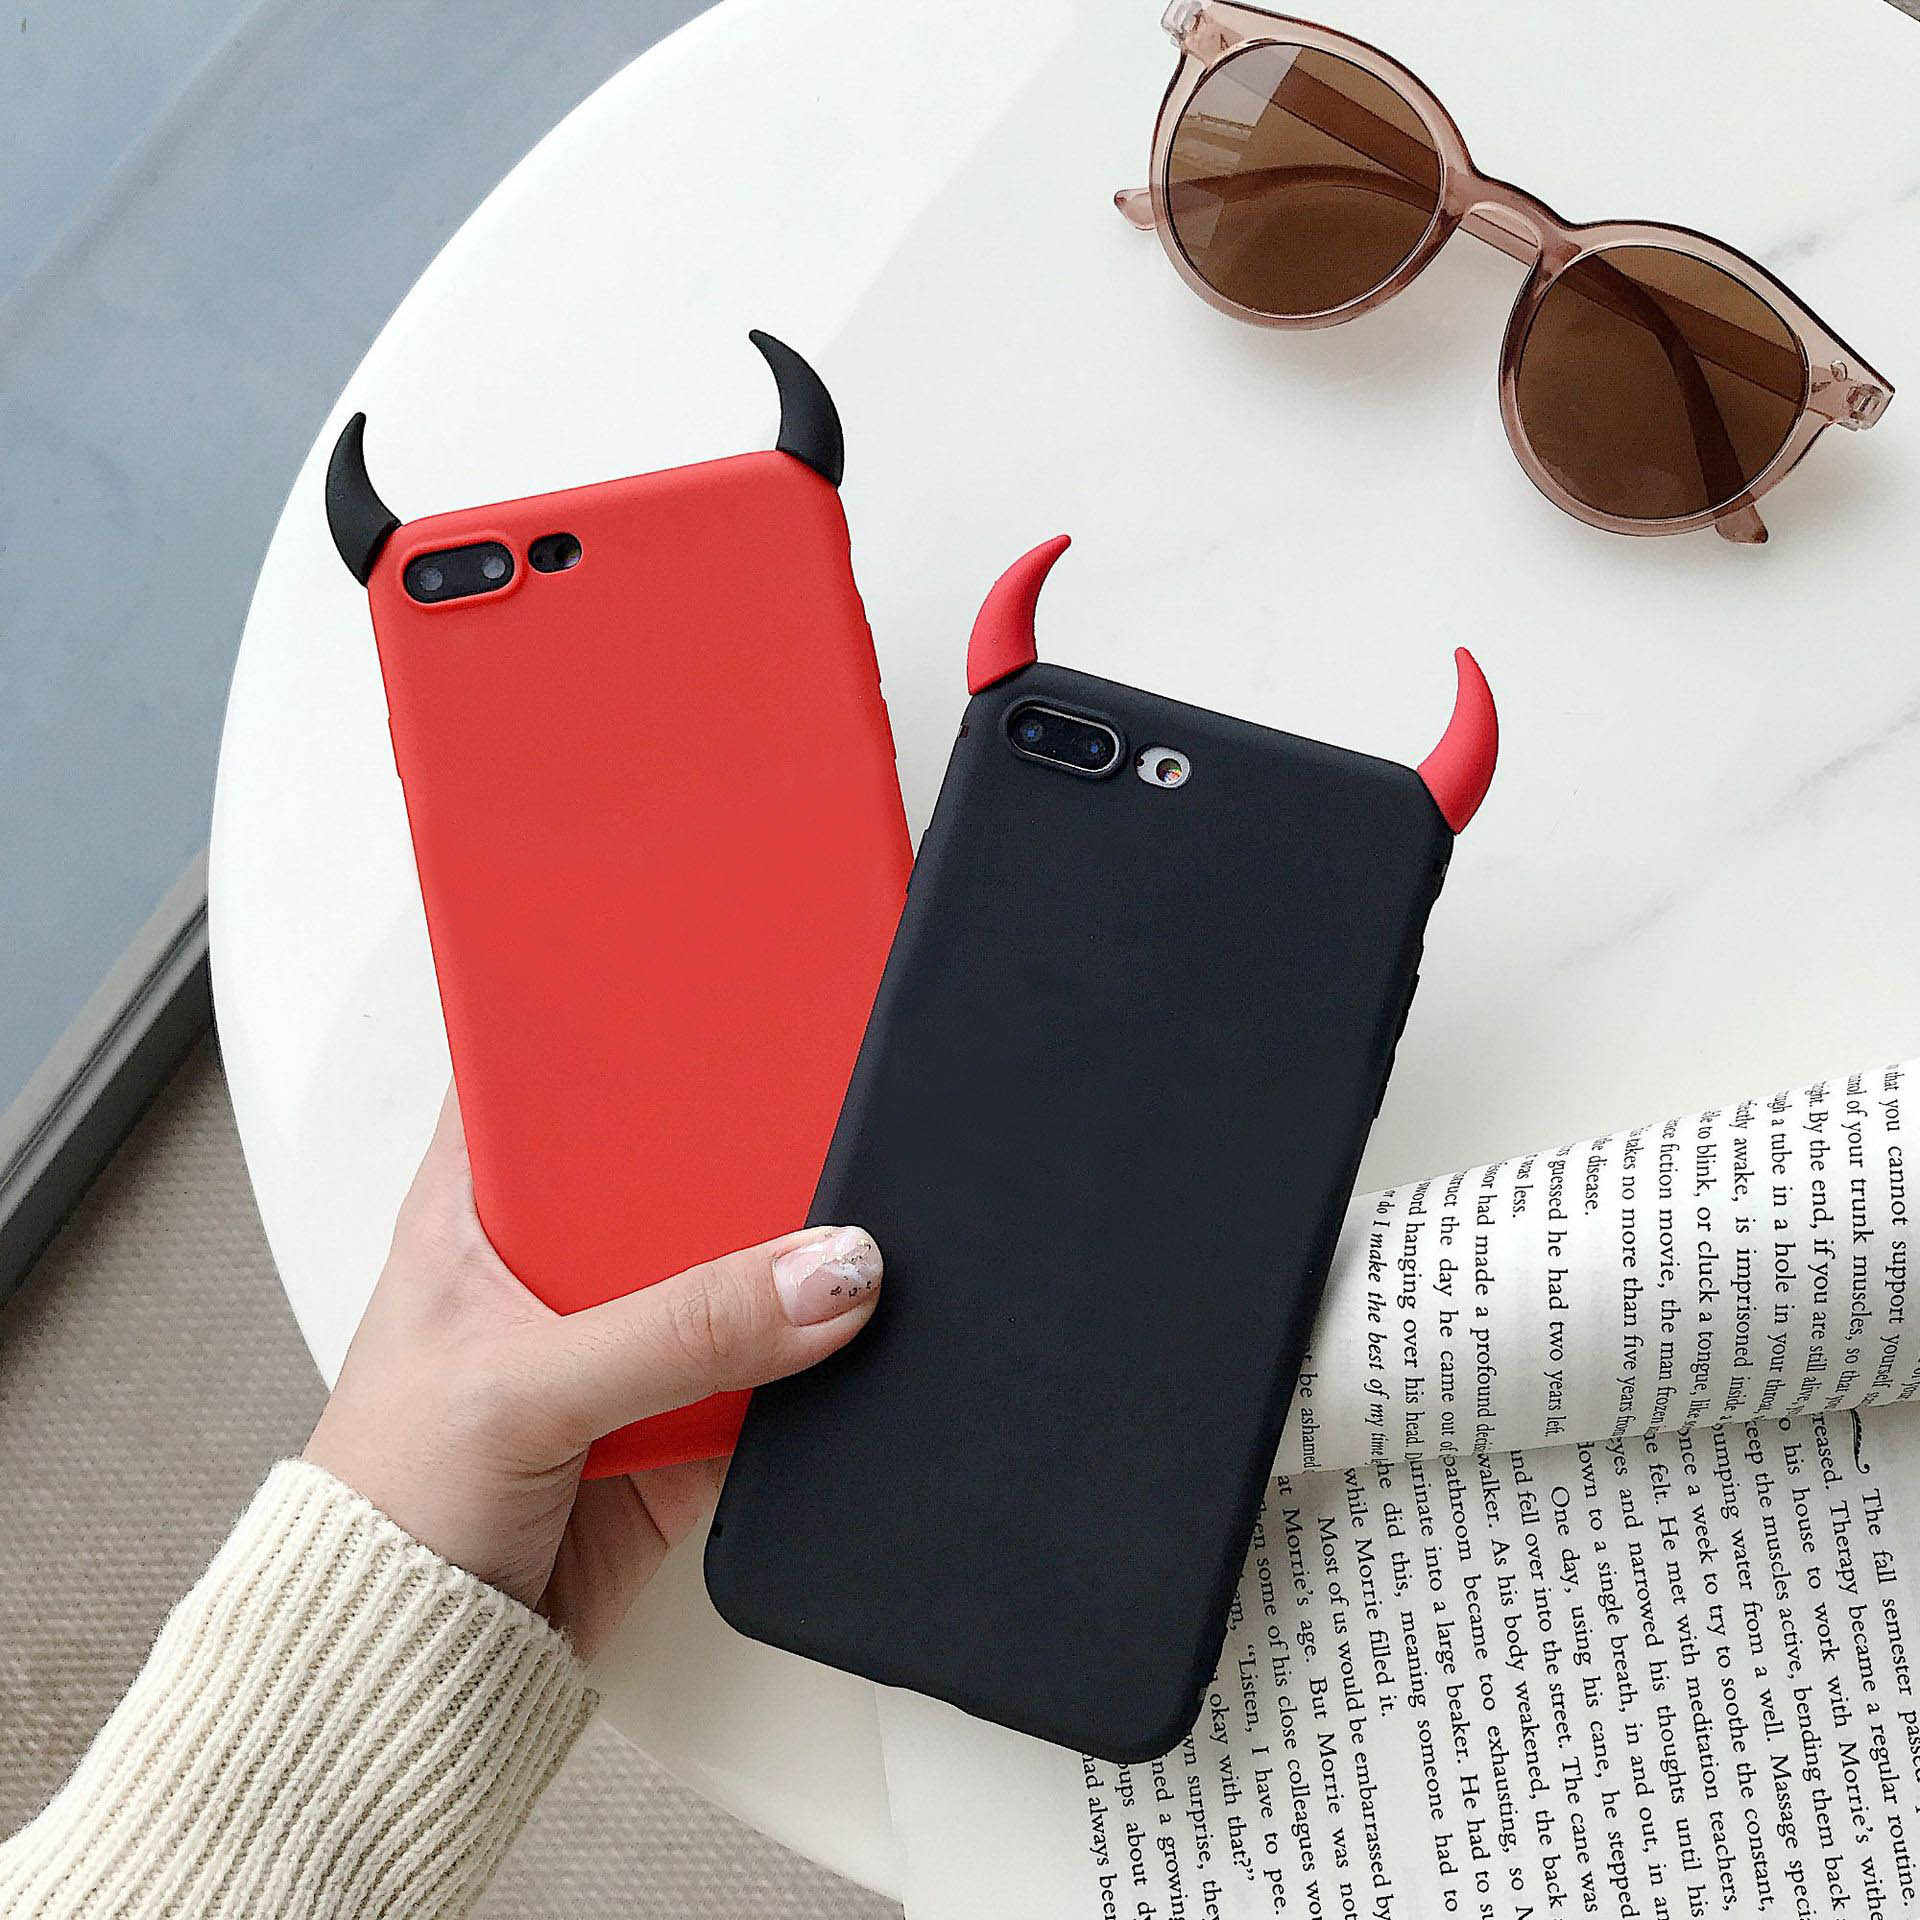 Para Samsung A7 2018 A8 A5 A9 2018 A7 M10 M20 M30 A50 A70 A40 A6Plus 2018 Telefone Cor Caso Doces TPU Macio Coque DIY Diabo Chifre